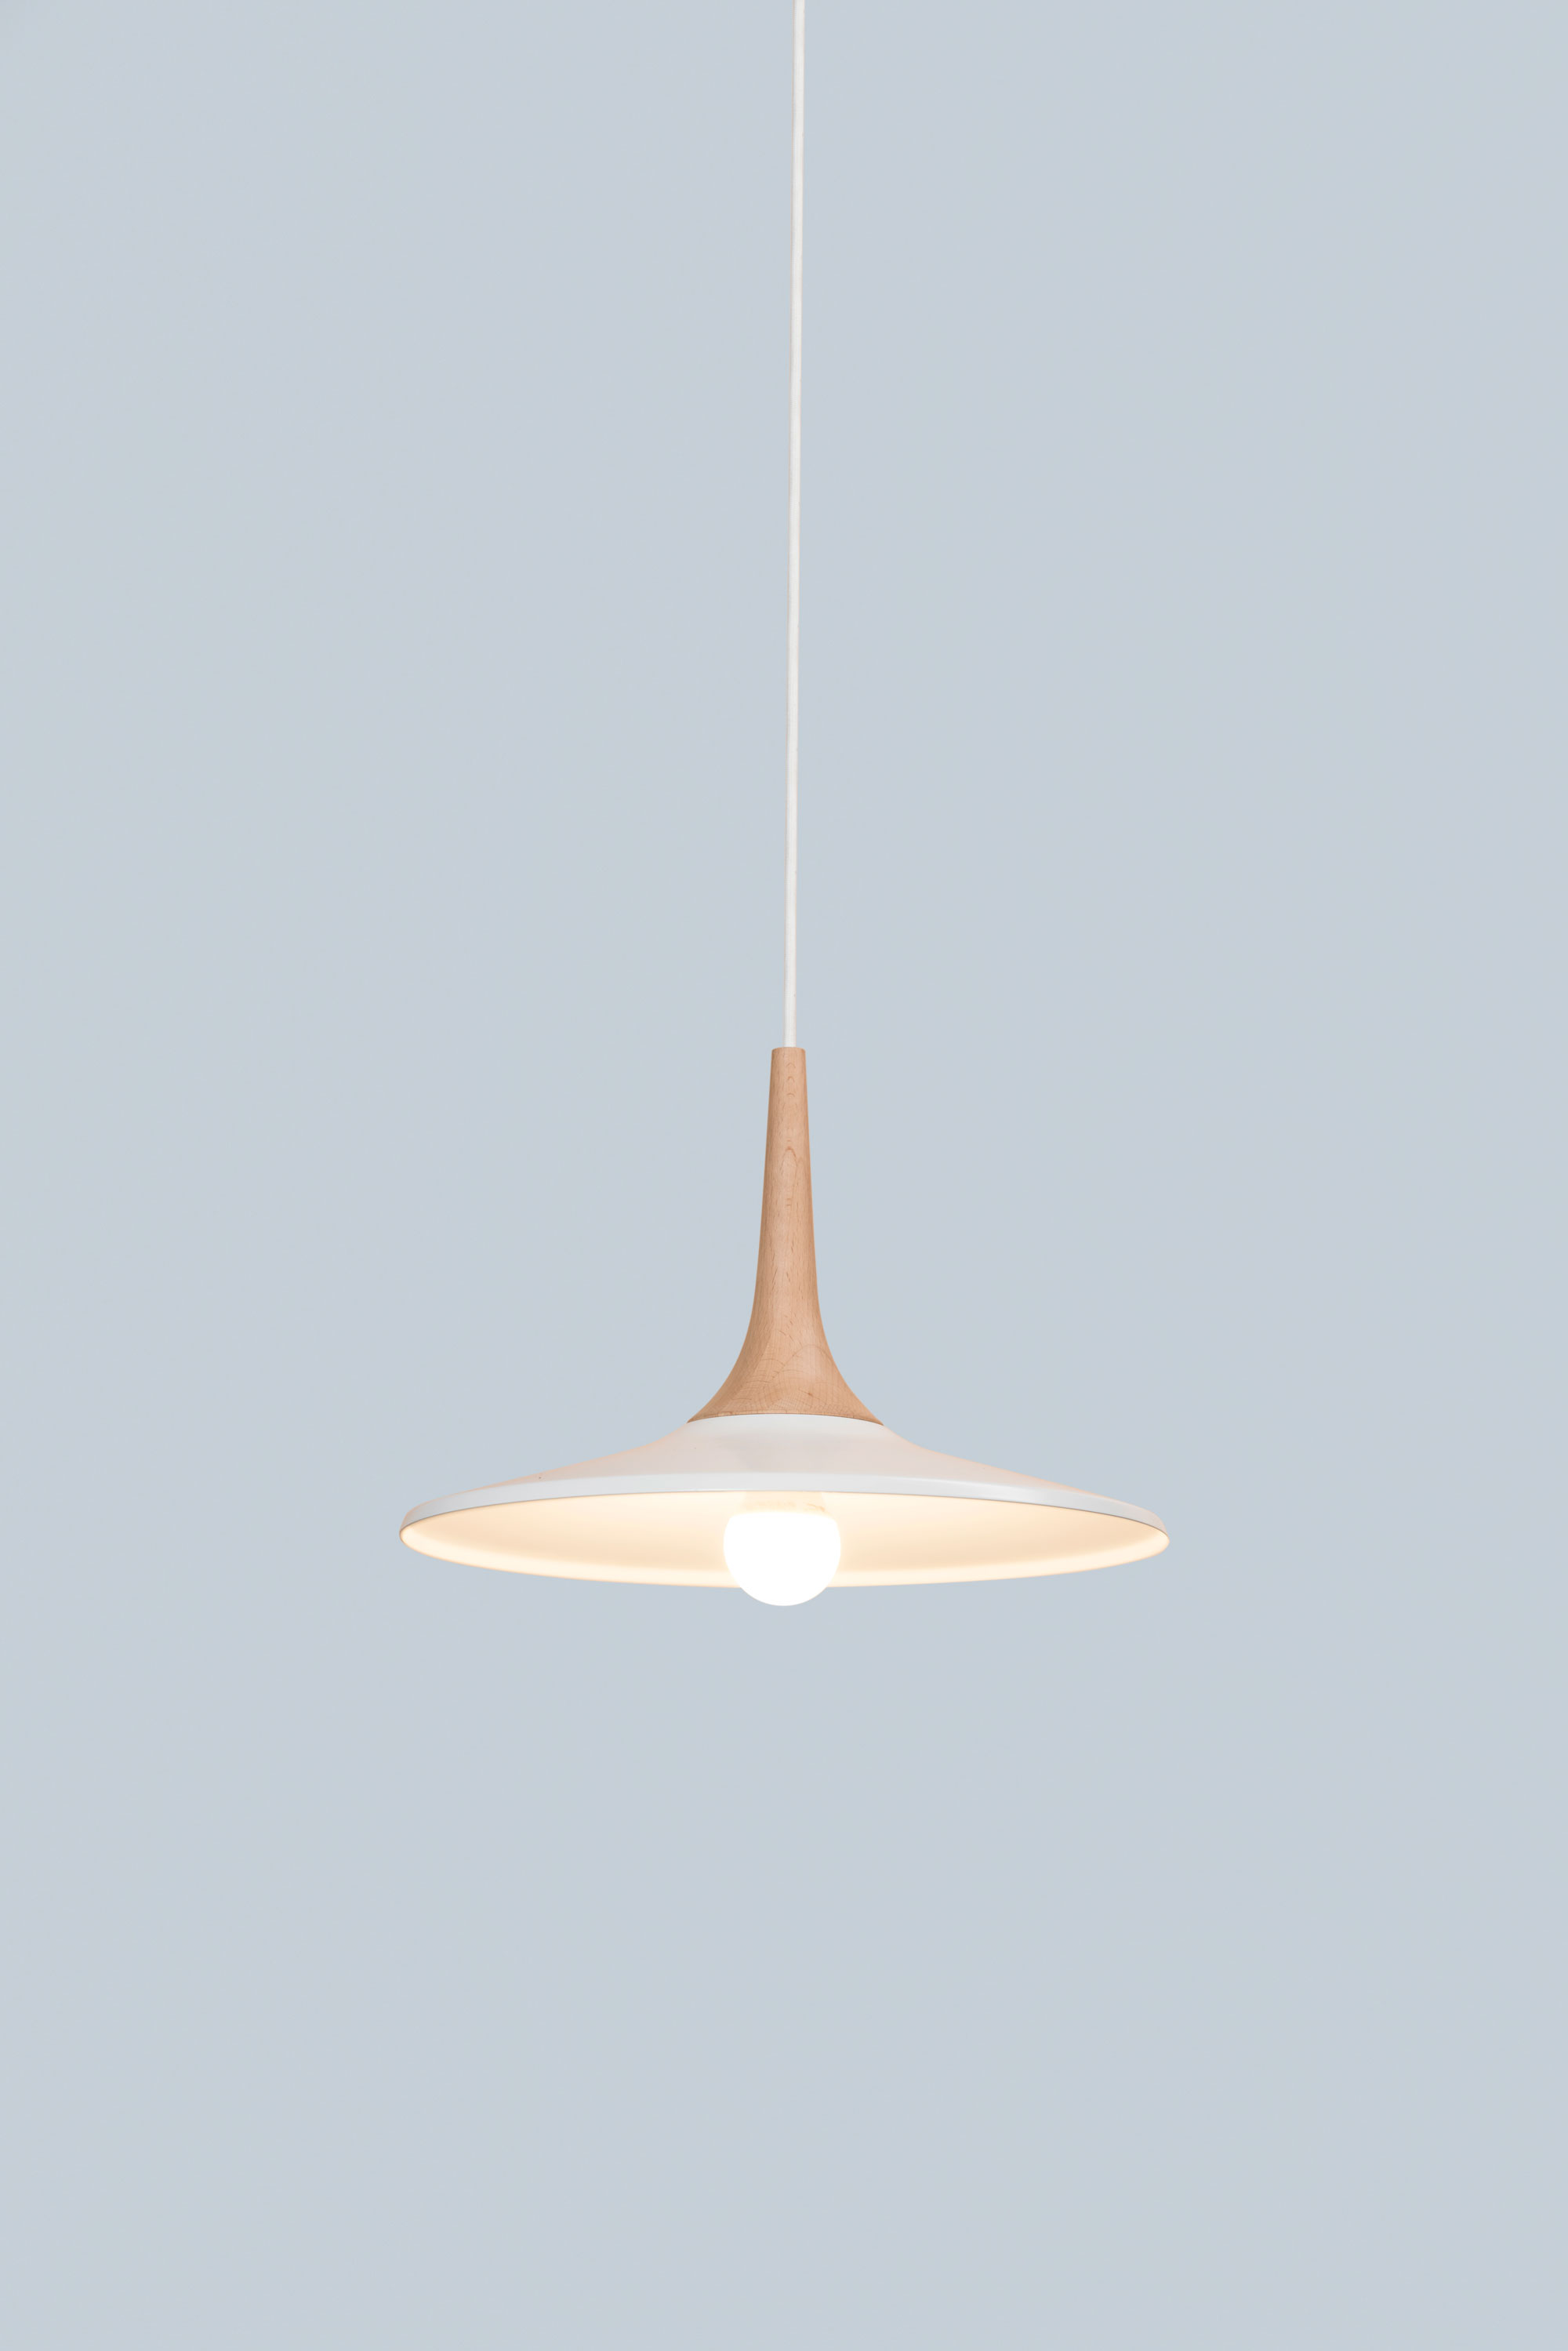 masavukmanovic.com - olá! hanging lamp 02